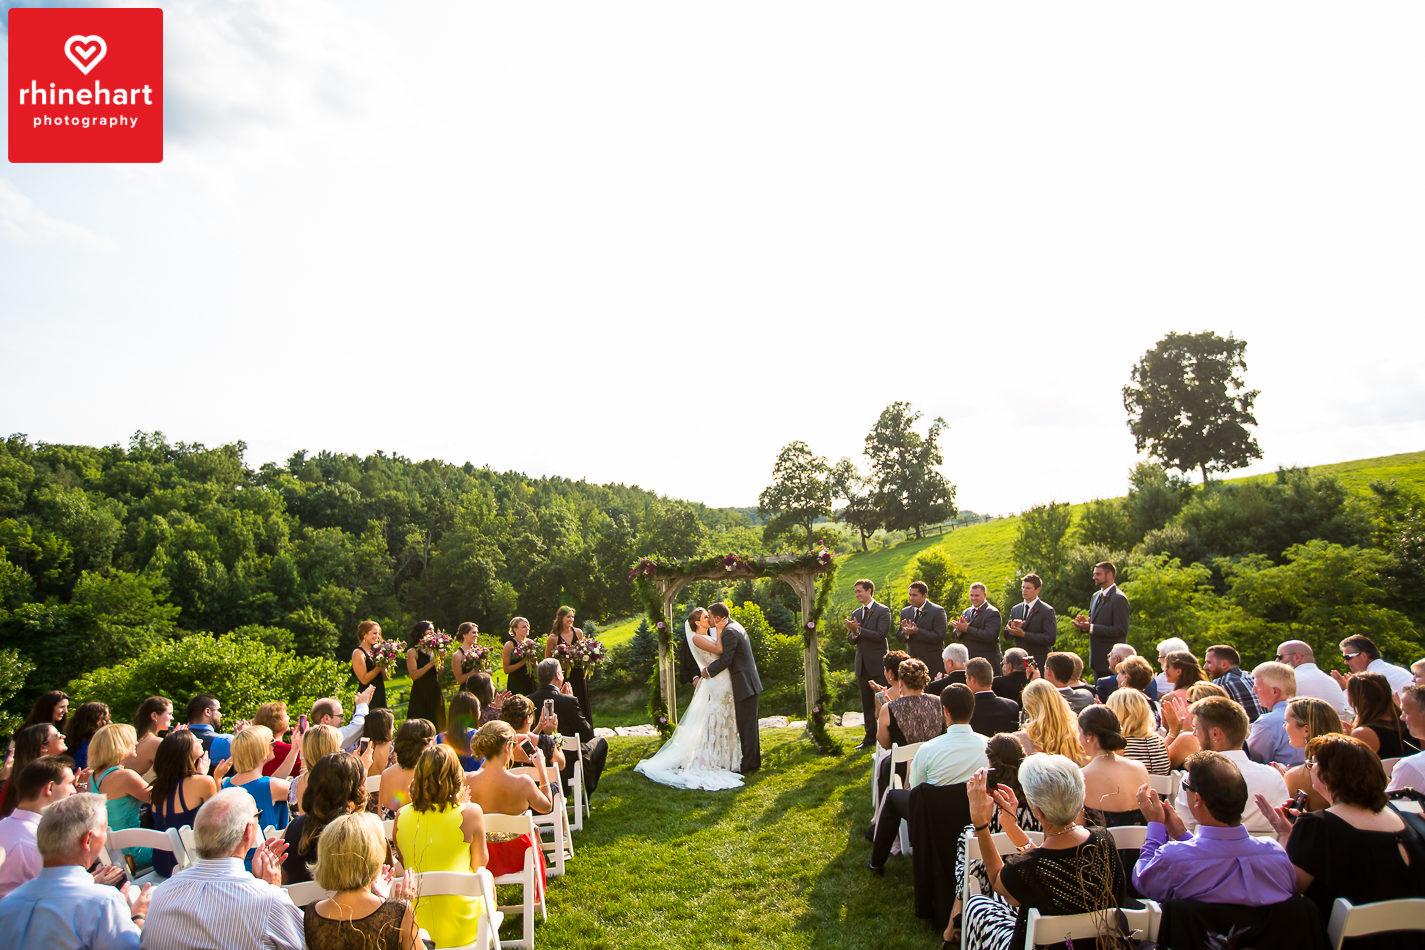 glasbern-inn-wedding-photographer-227